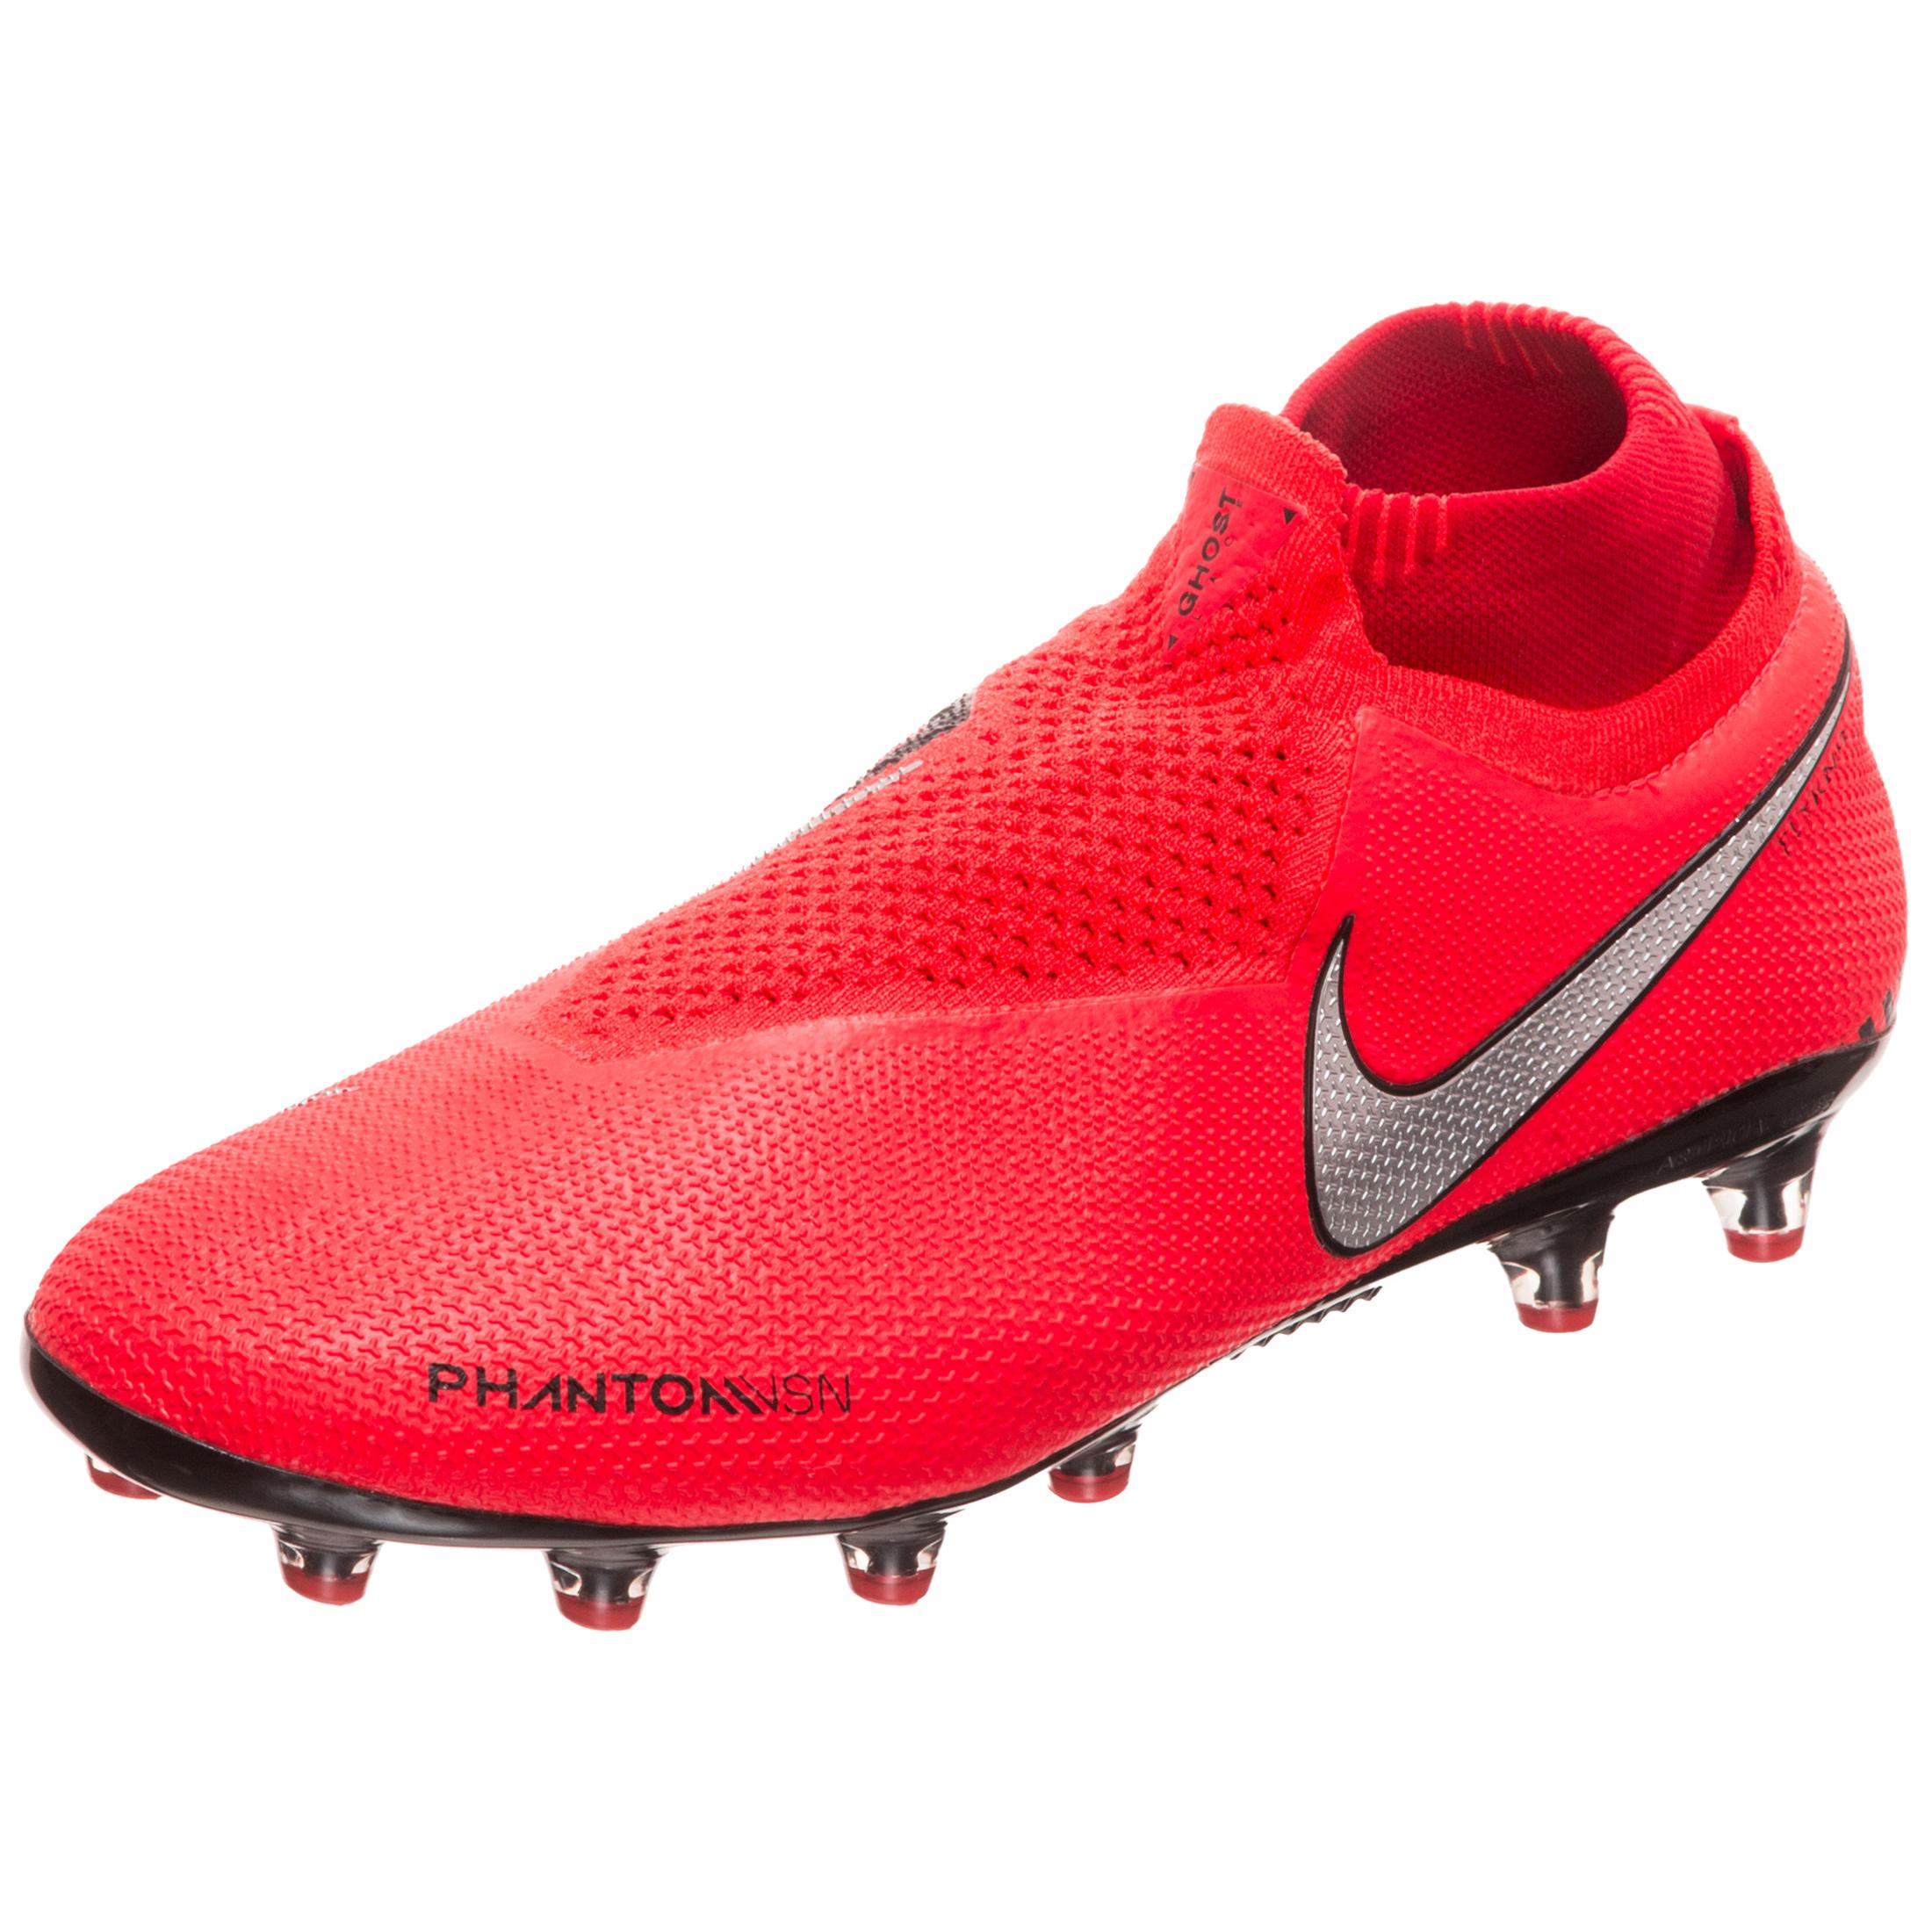 7a975dfd3382 Nike Phantom Vision Elite Dynamic Fit Artificial-Grass Football Boot - Red  | AO3261-600 | FOOTY.COM